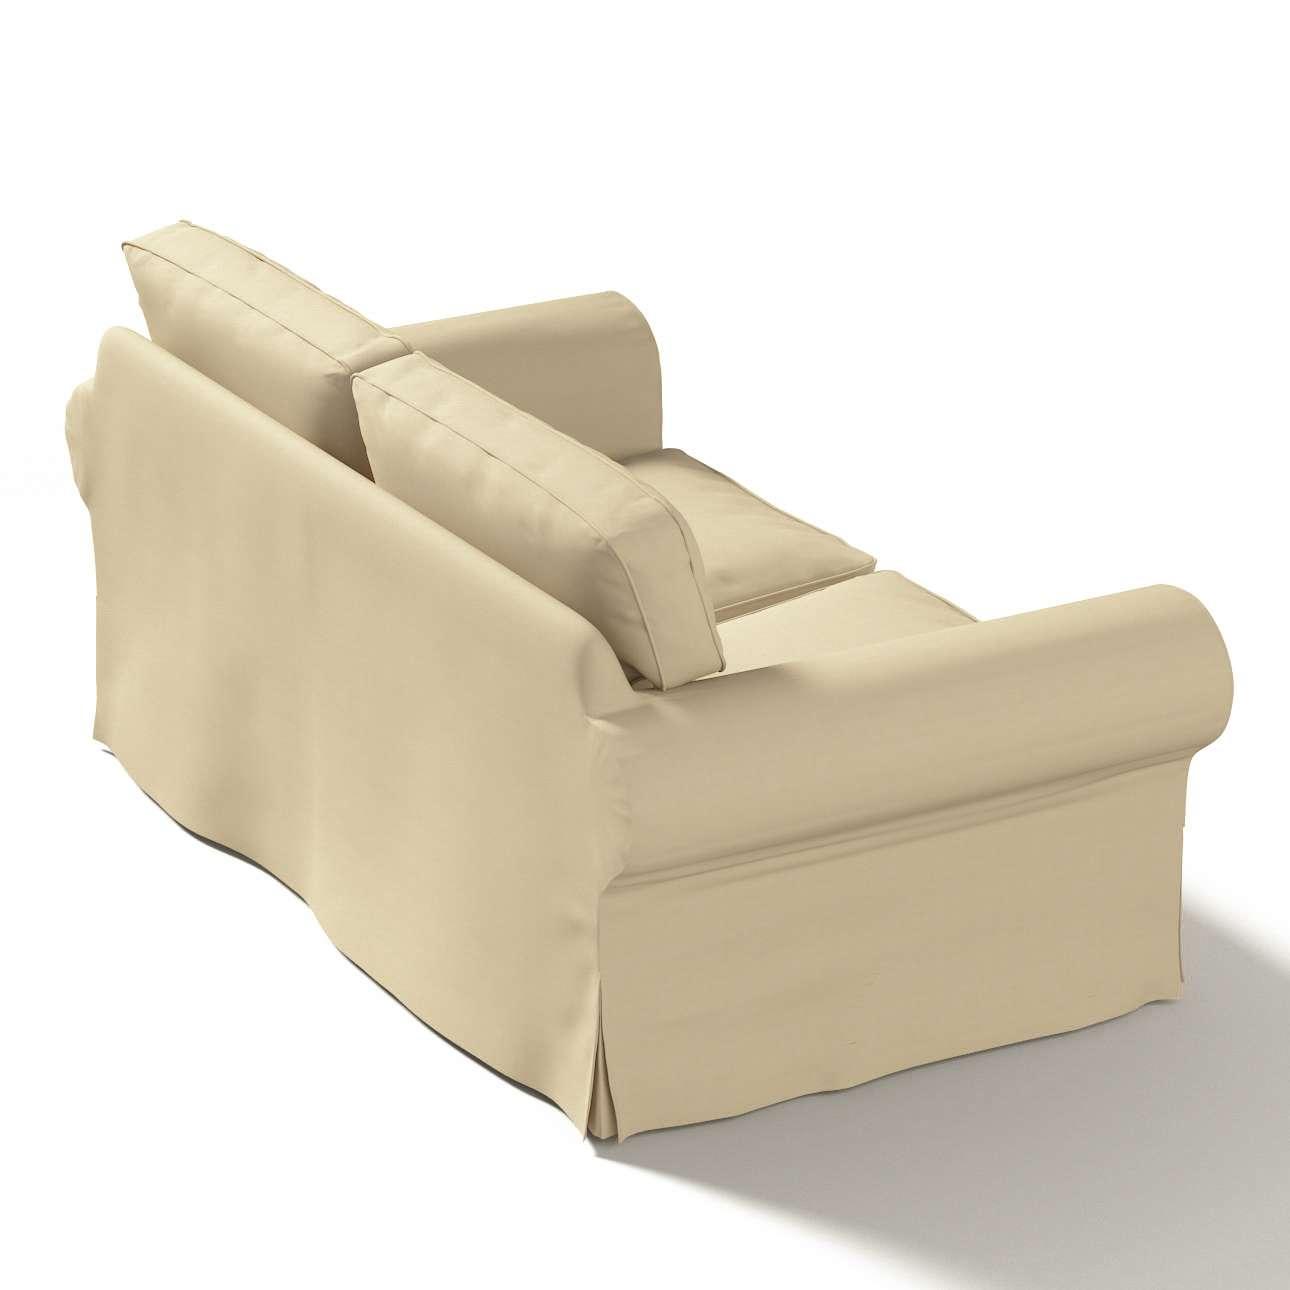 Ektorp 2-Sitzer Schlafsofabezug  ALTES Modell Sofabezug Ektorp 2-Sitzer Schlafsofa altes Modell von der Kollektion Cotton Panama, Stoff: 702-01